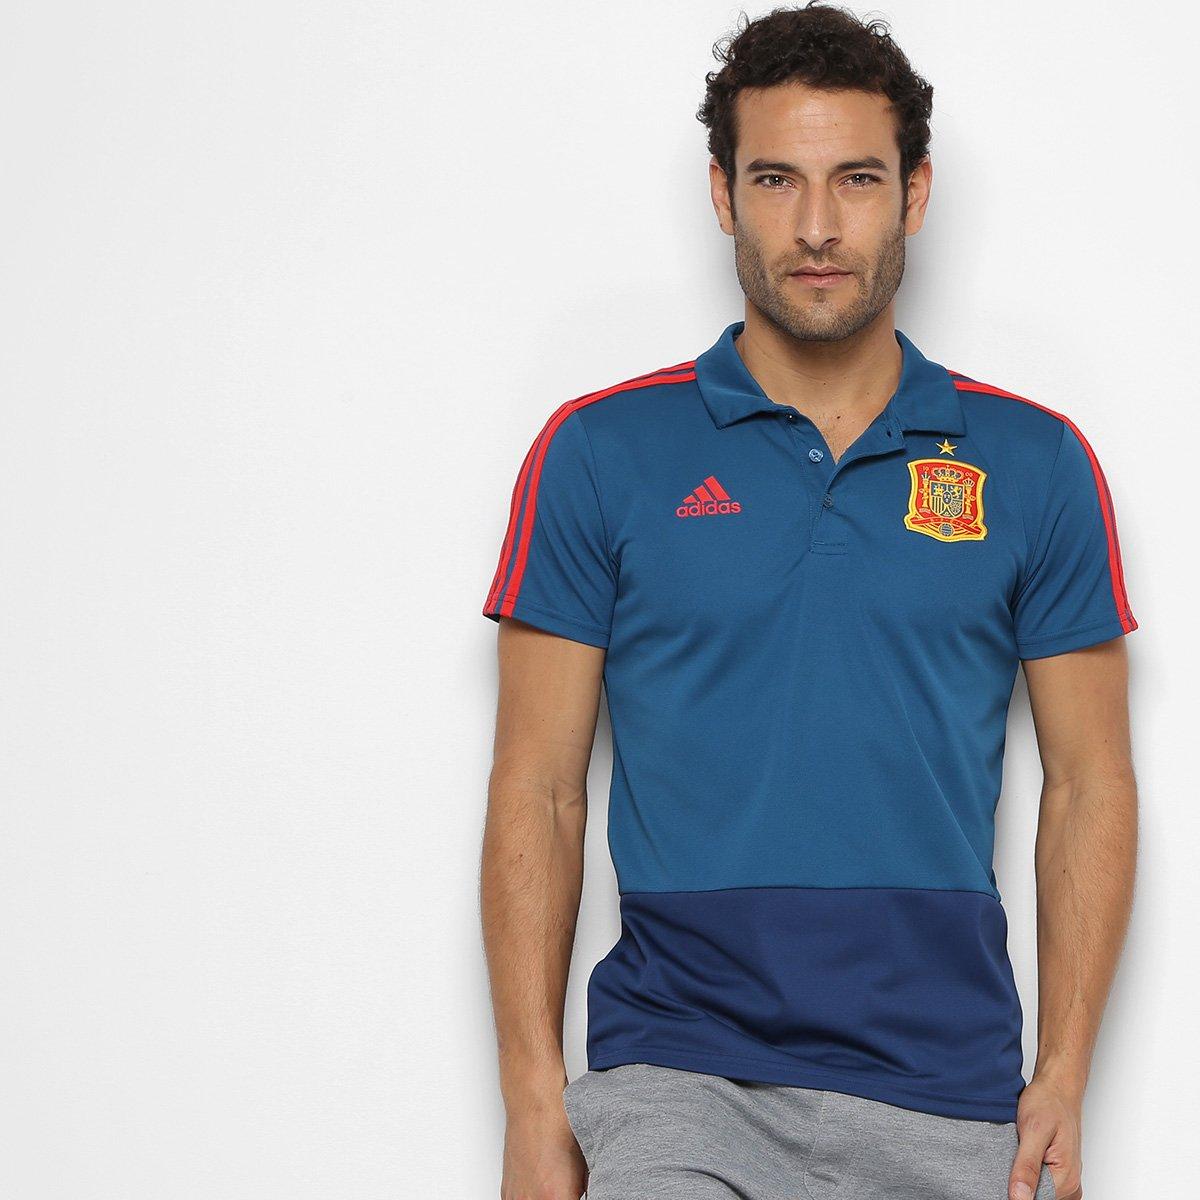 Camisa Polo Espanha Adidas Masculina - Compre Agora  2e8e780fbdcd7